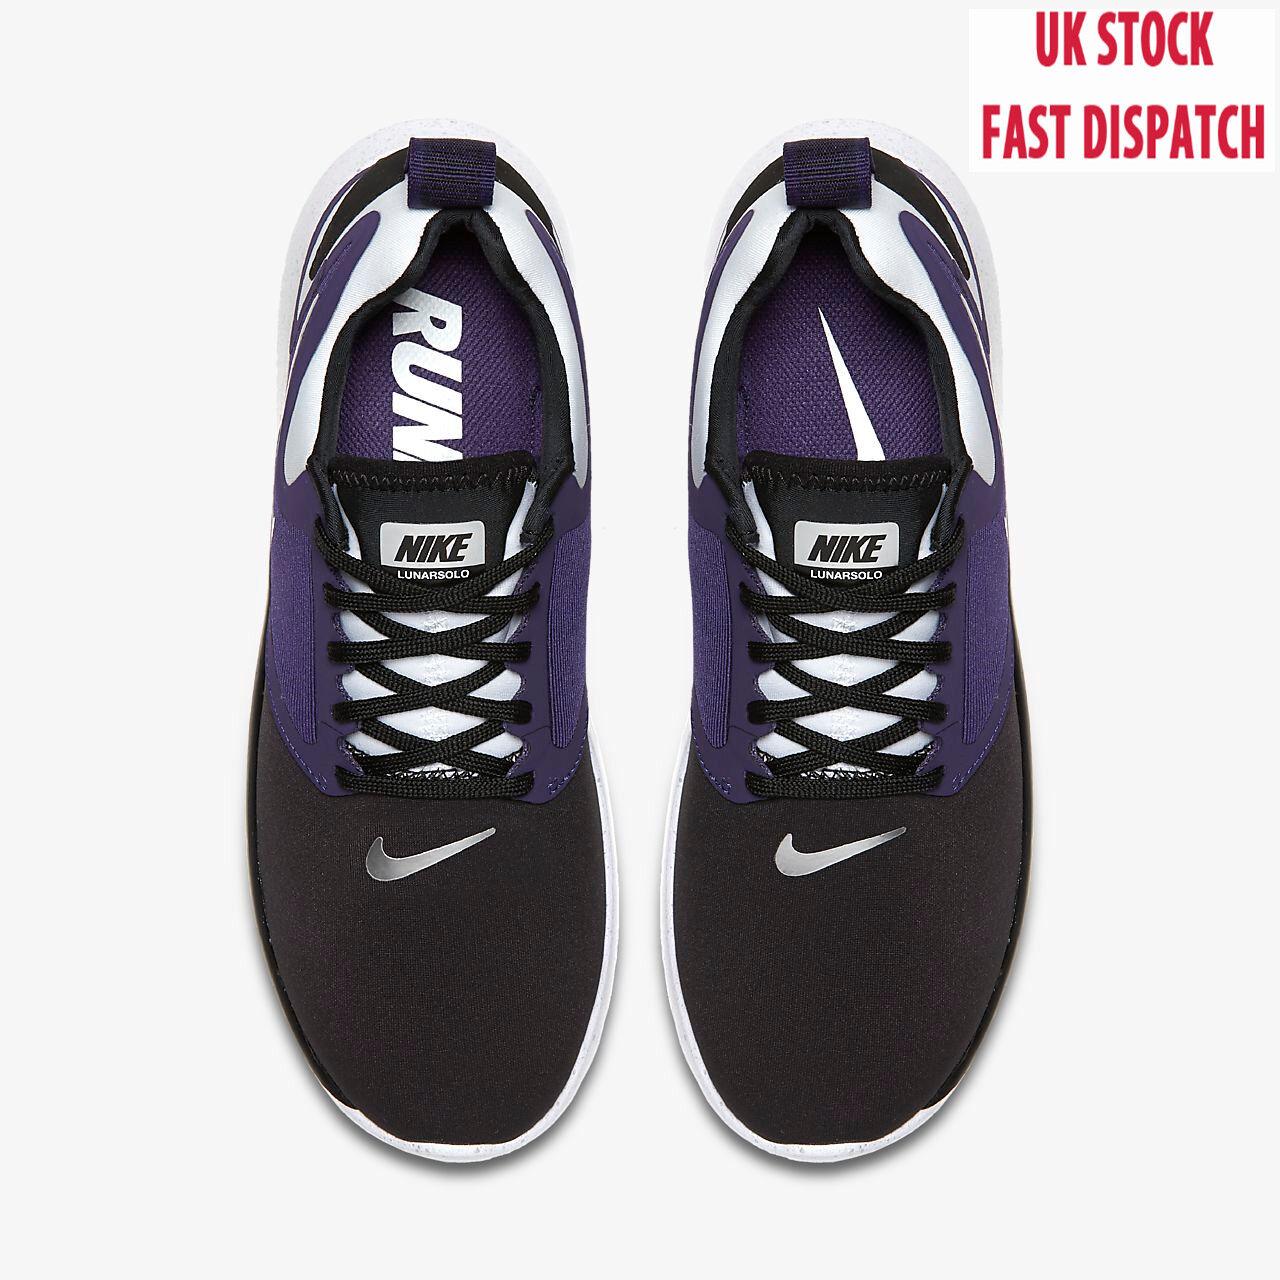 5c8b3ad811 Hot Nike LunarSolo Trainers Running shoes sneakers Purple Black metallic